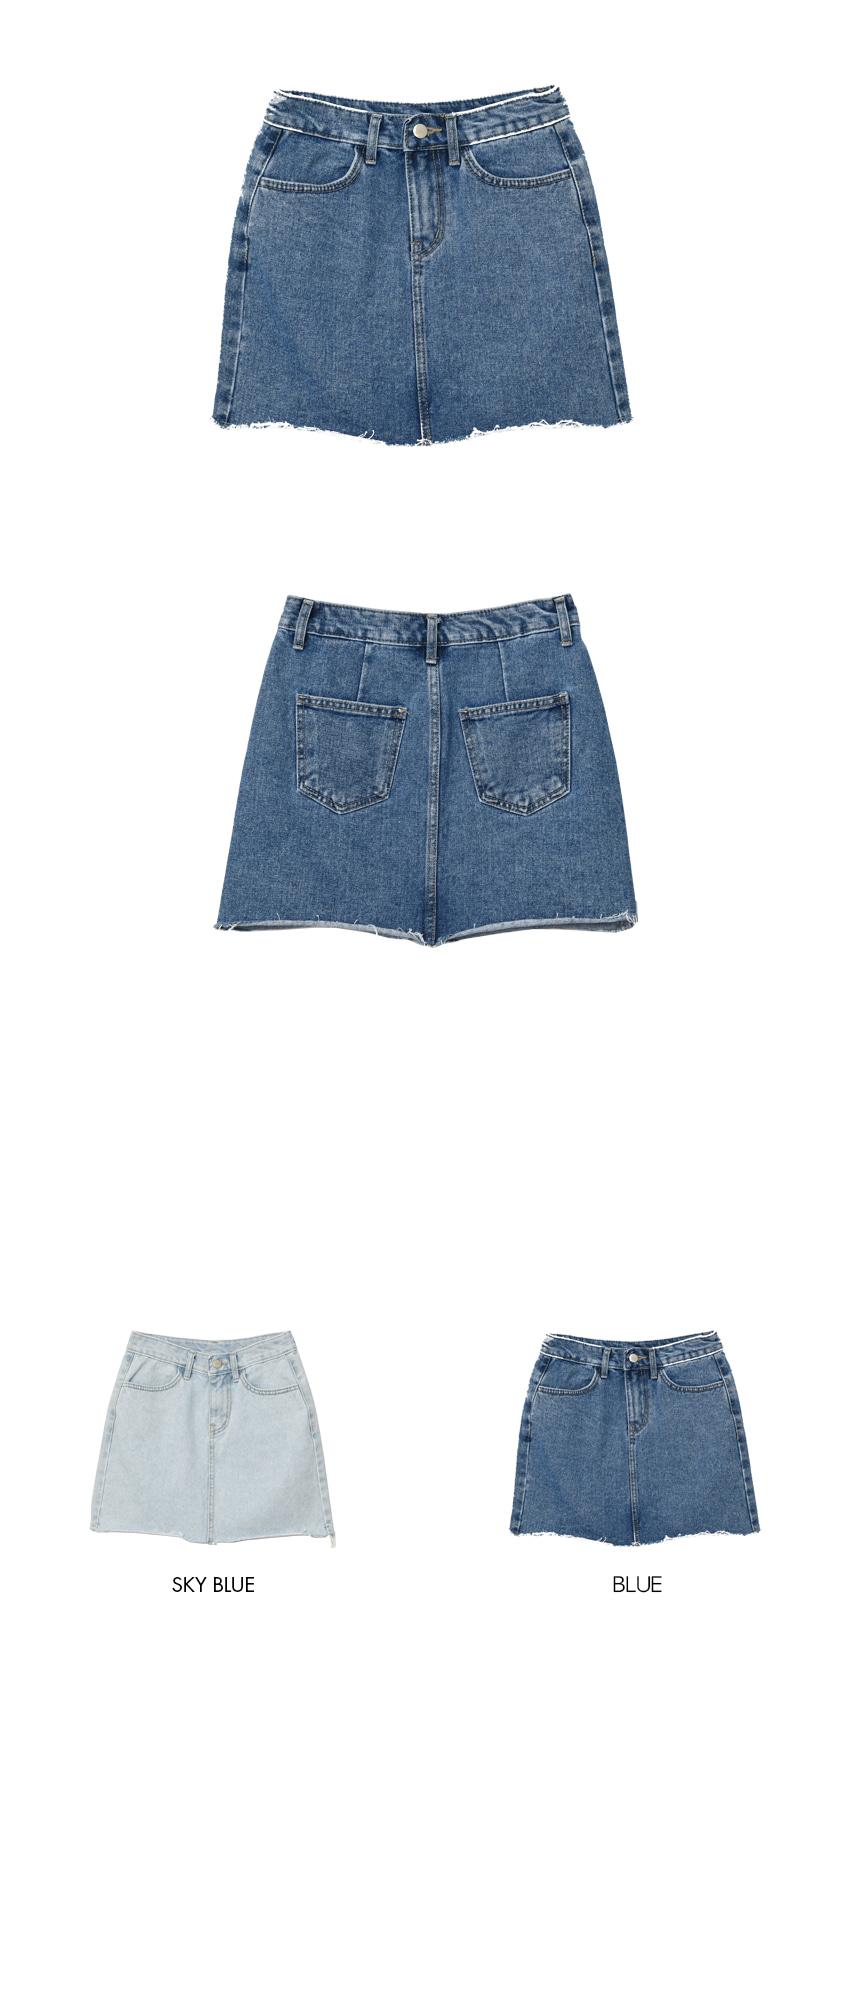 Simple cut denim skirt